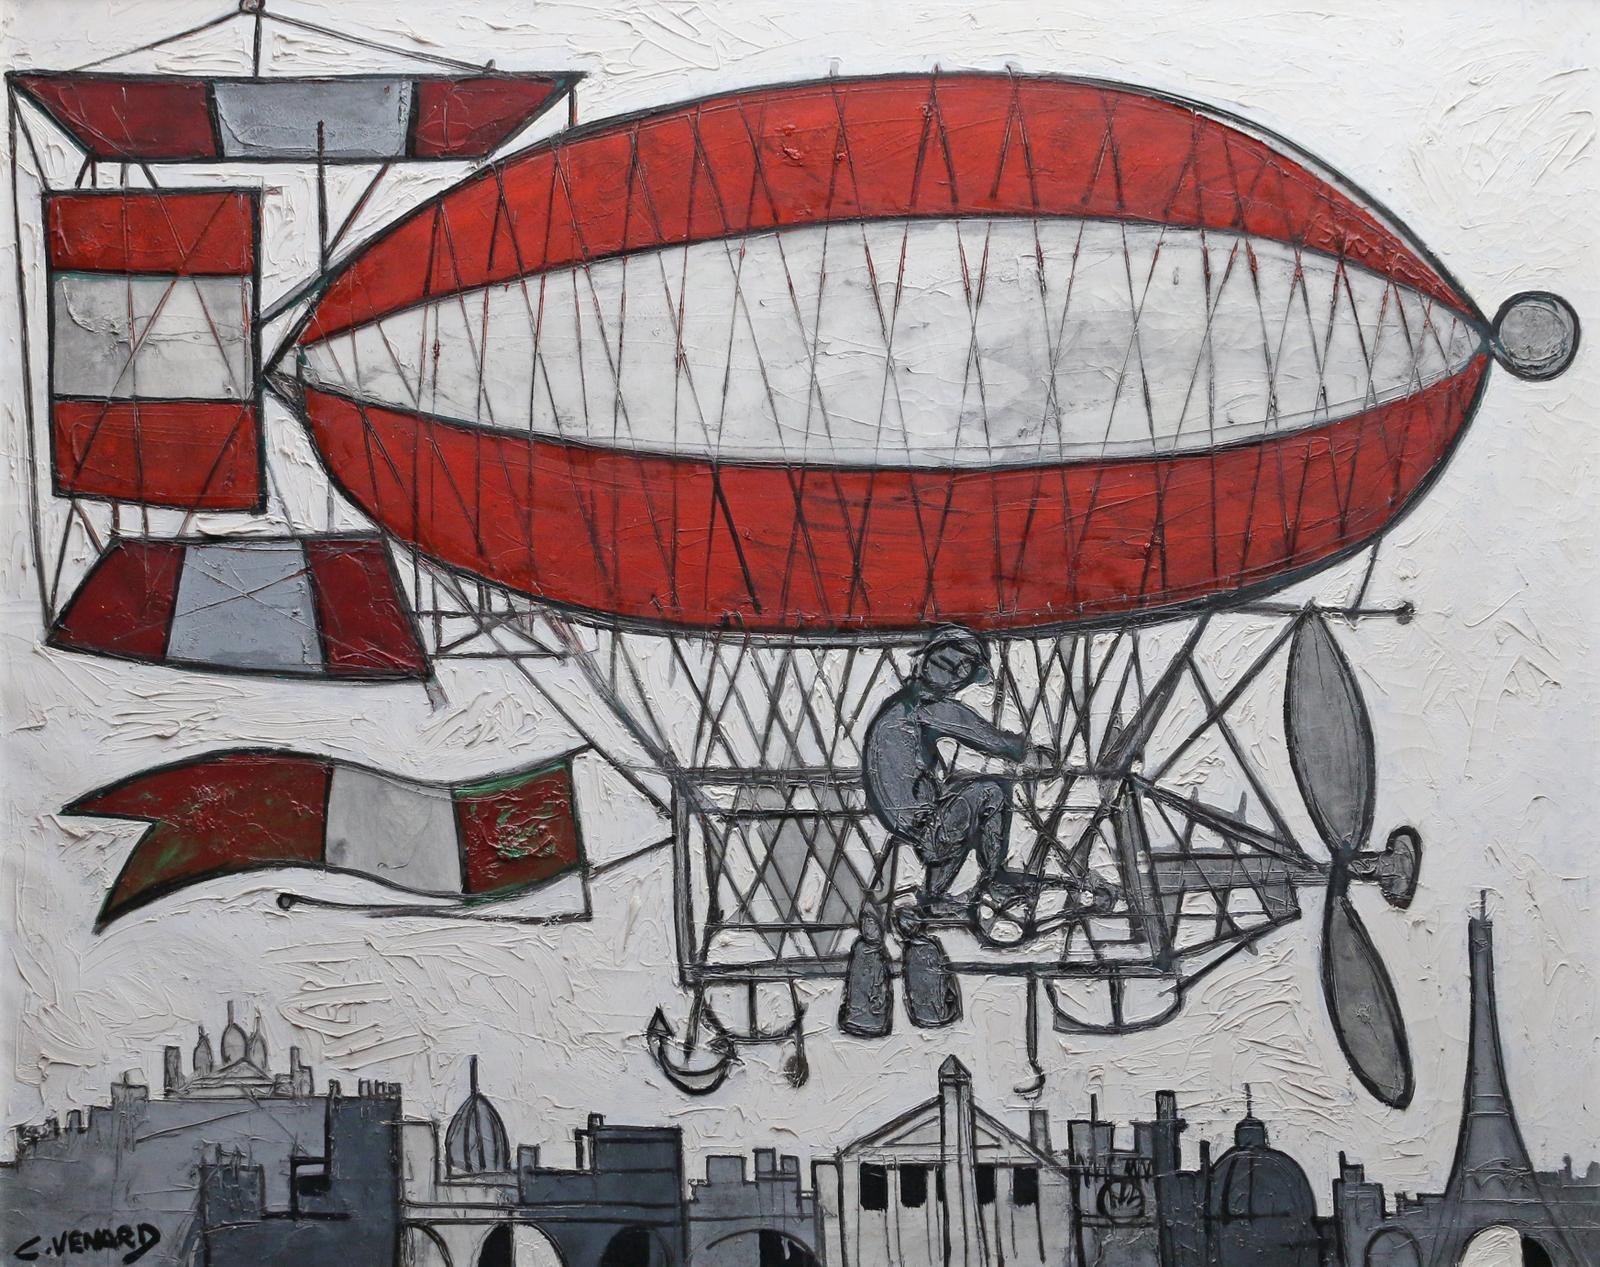 Lot 8 - CLAUDE VENARD (French, 1913-1999)